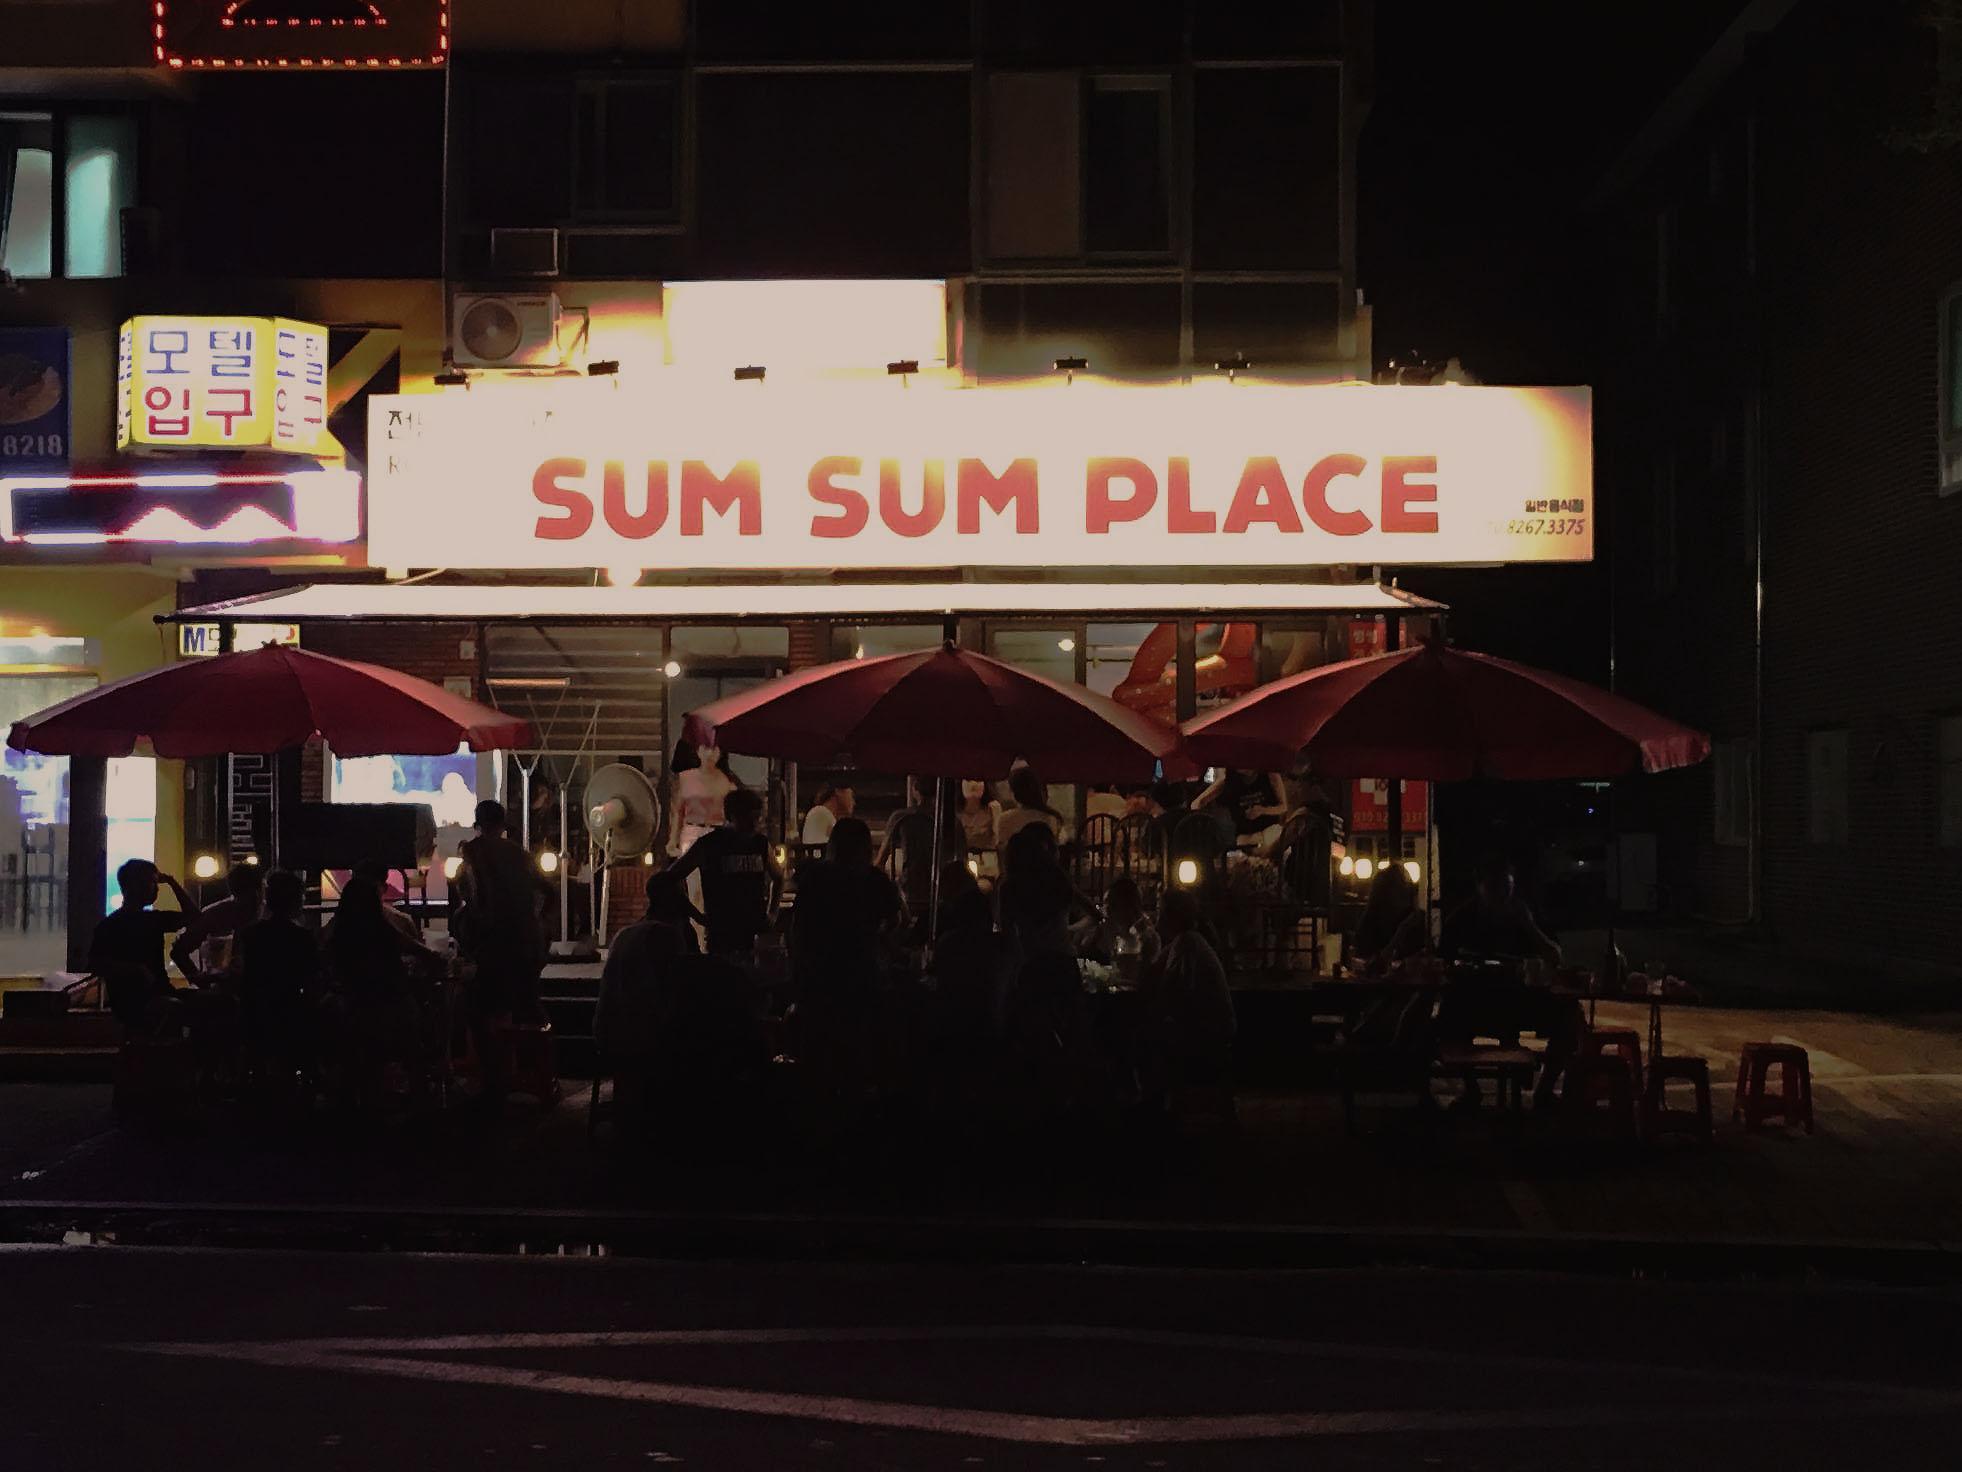 Sumsum Guest House